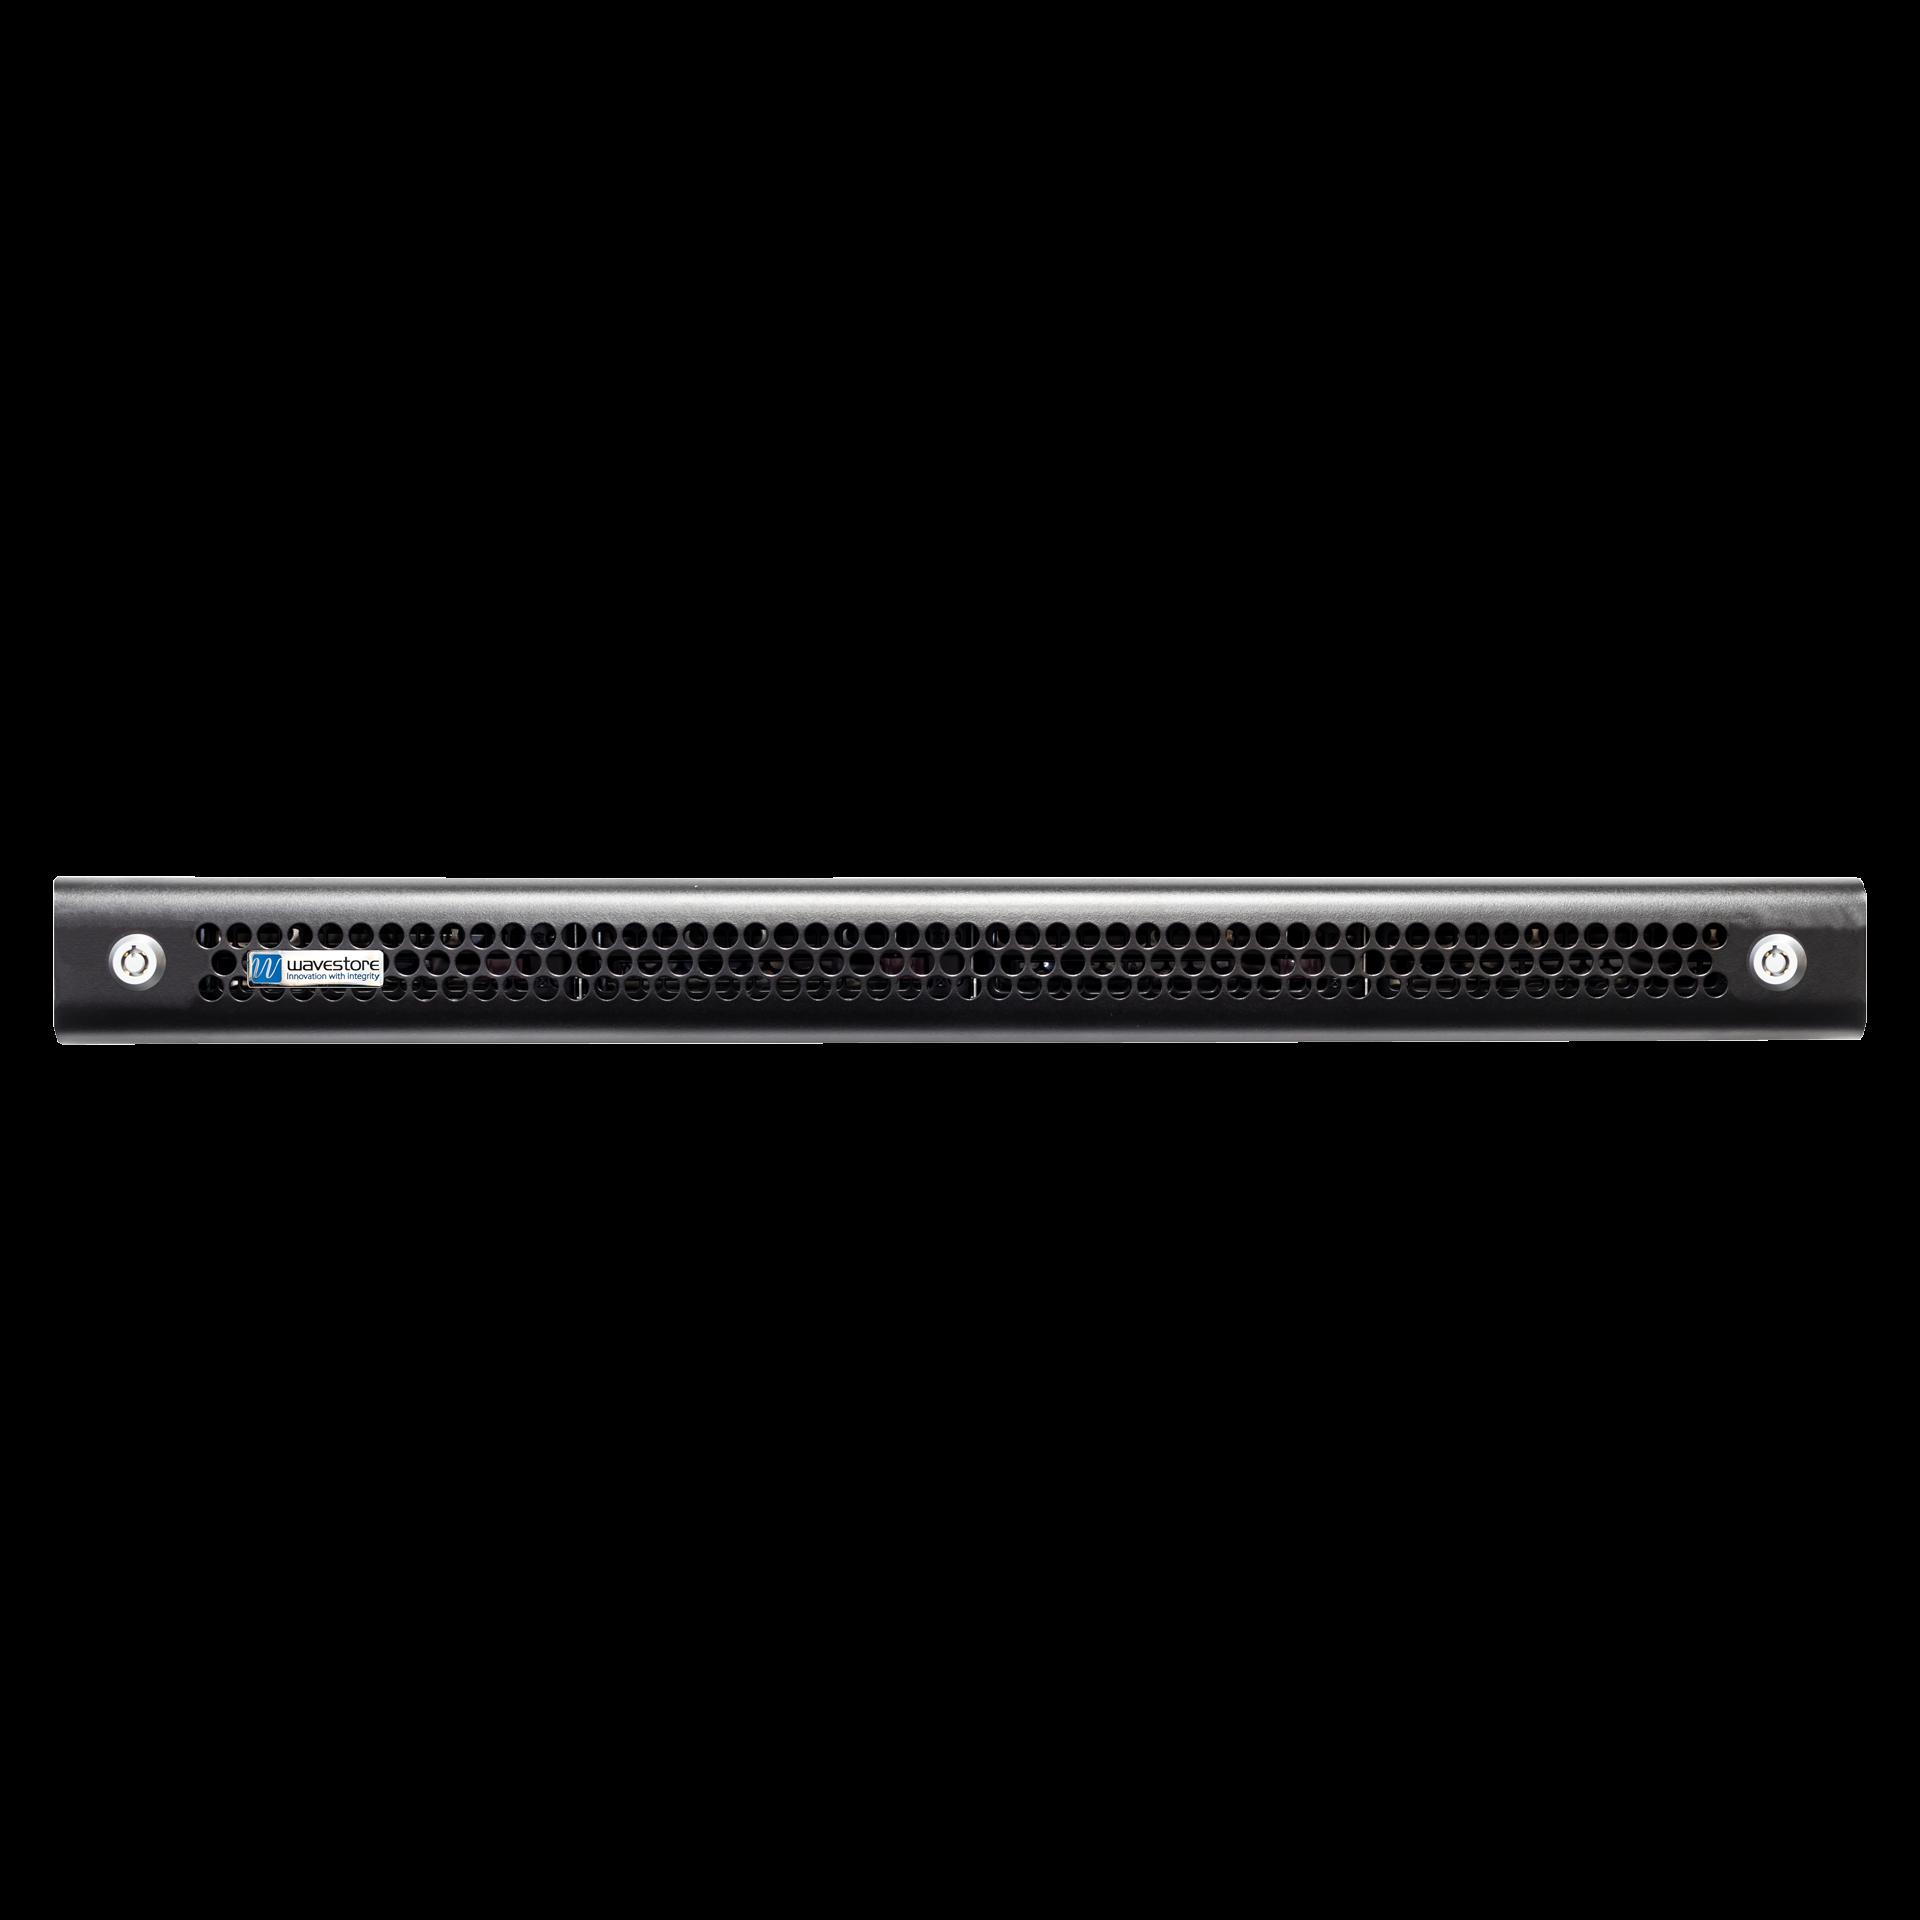 Q-Series Video Servers